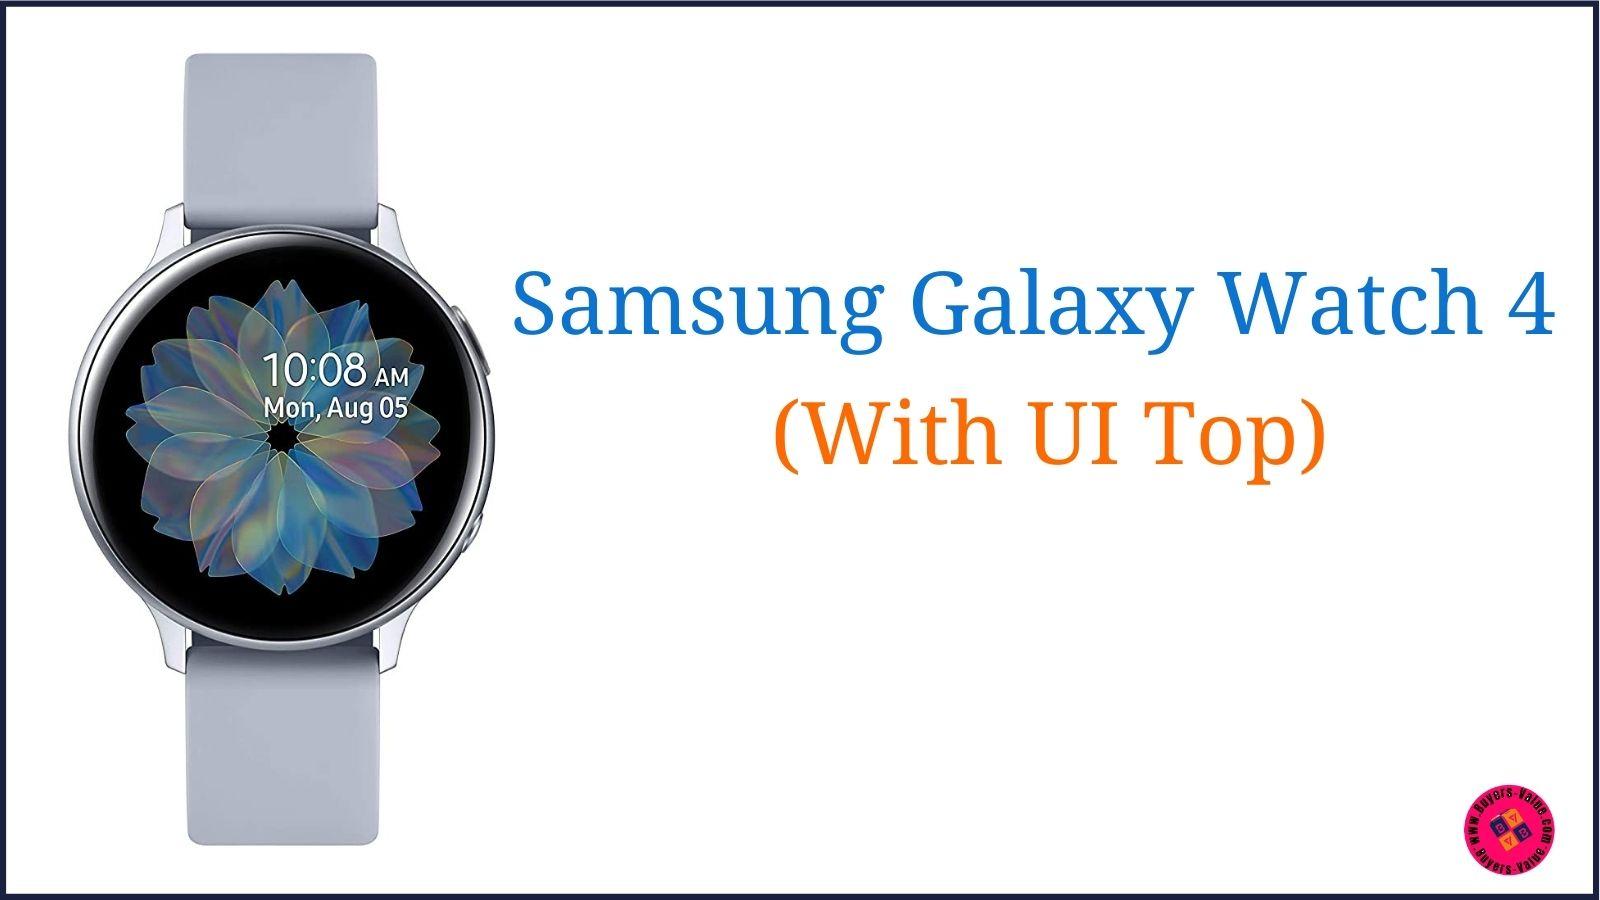 Samsung Galaxy Watch 4 Features